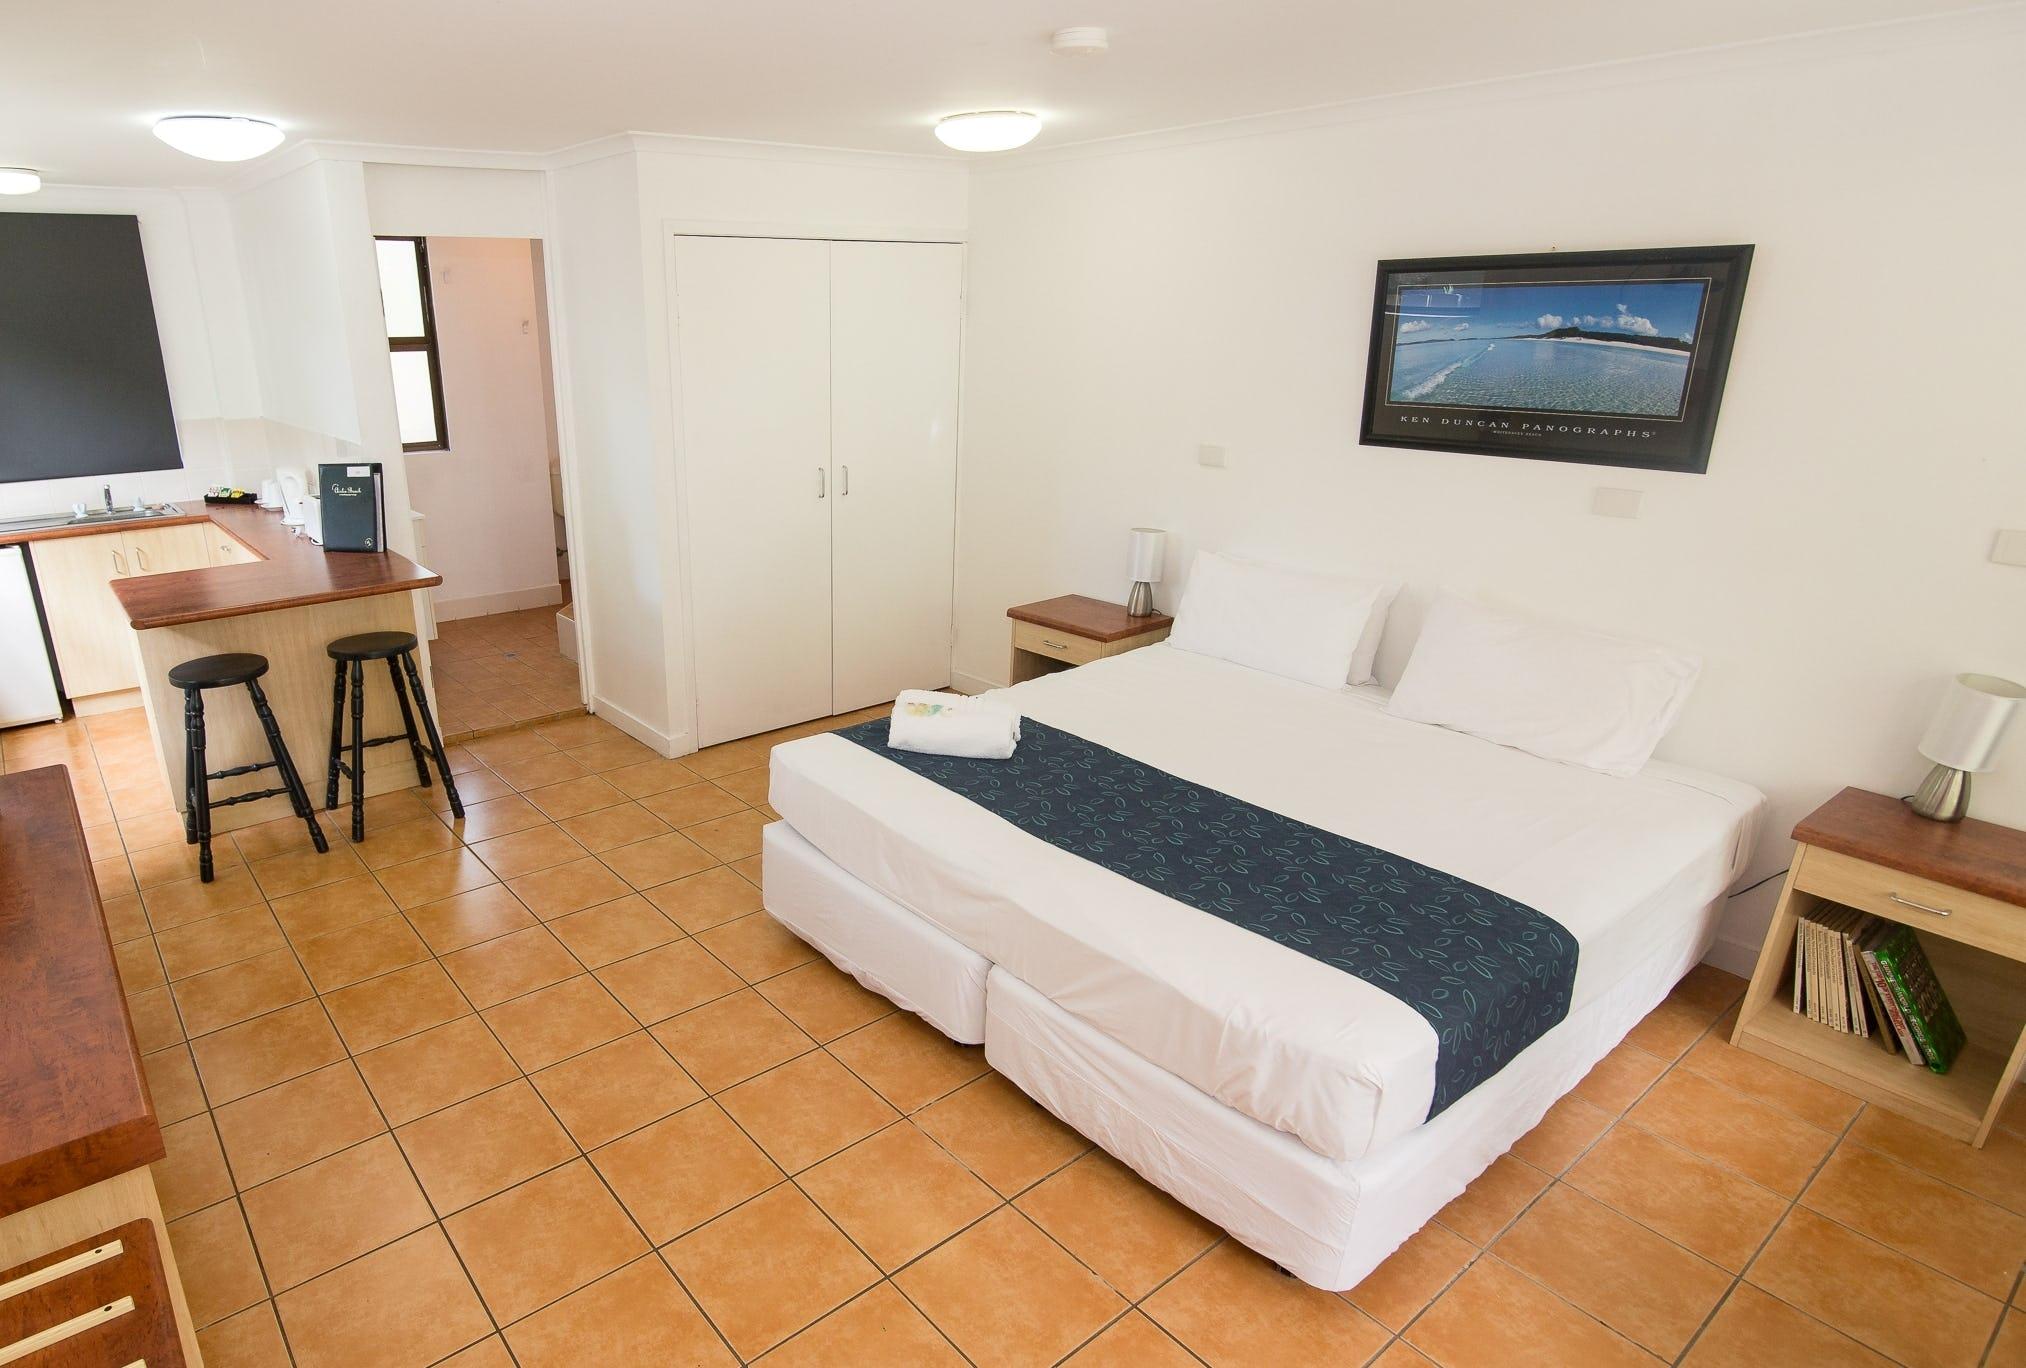 Base艾尔利滩背包客旅馆的私人房间